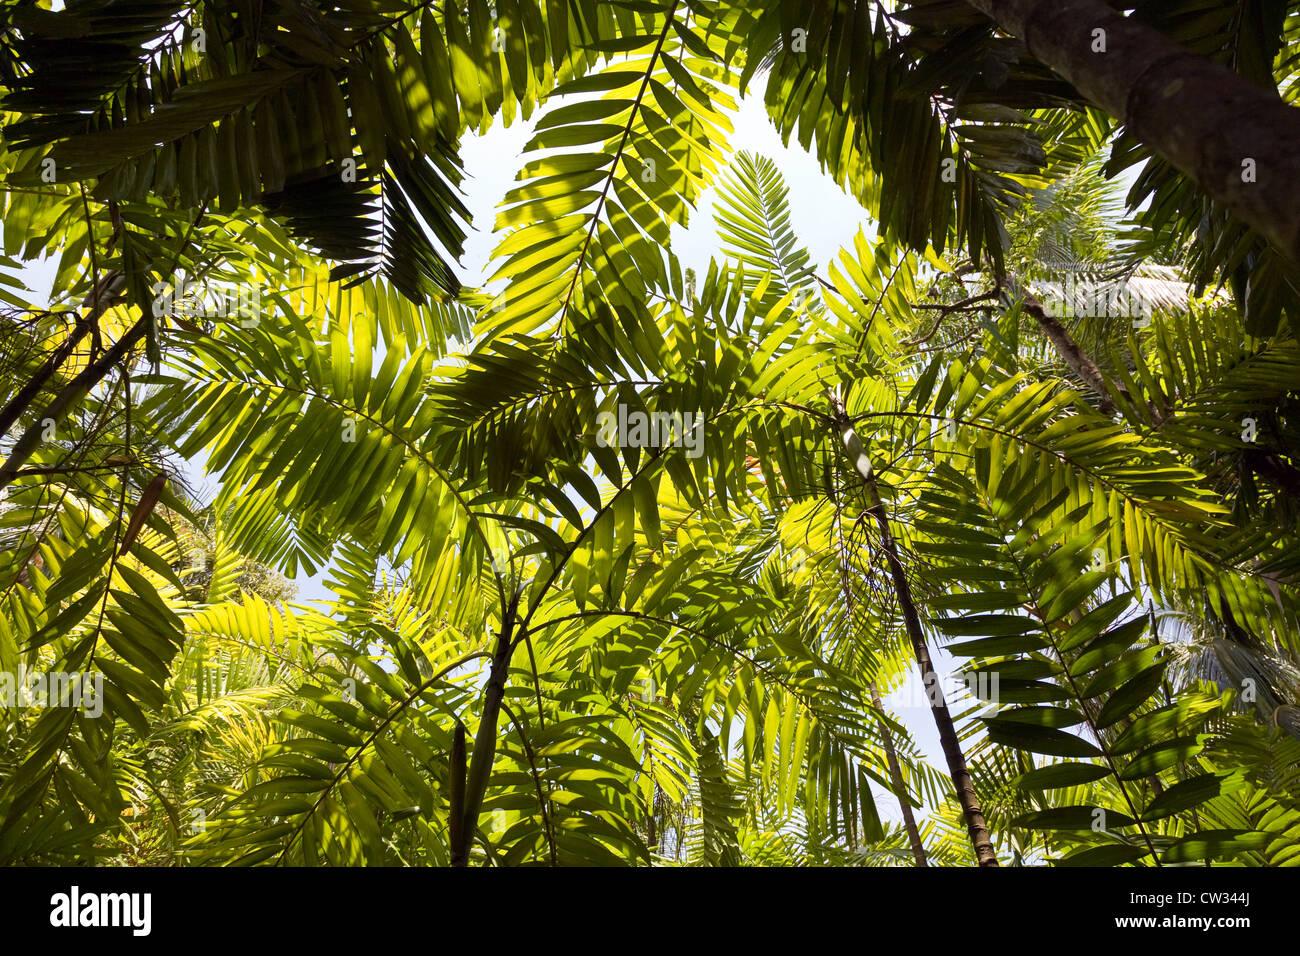 Manuel Antonio, Costa Rica: Palm jungles dot the hillsides of this vacation area hamlet. - Stock Image